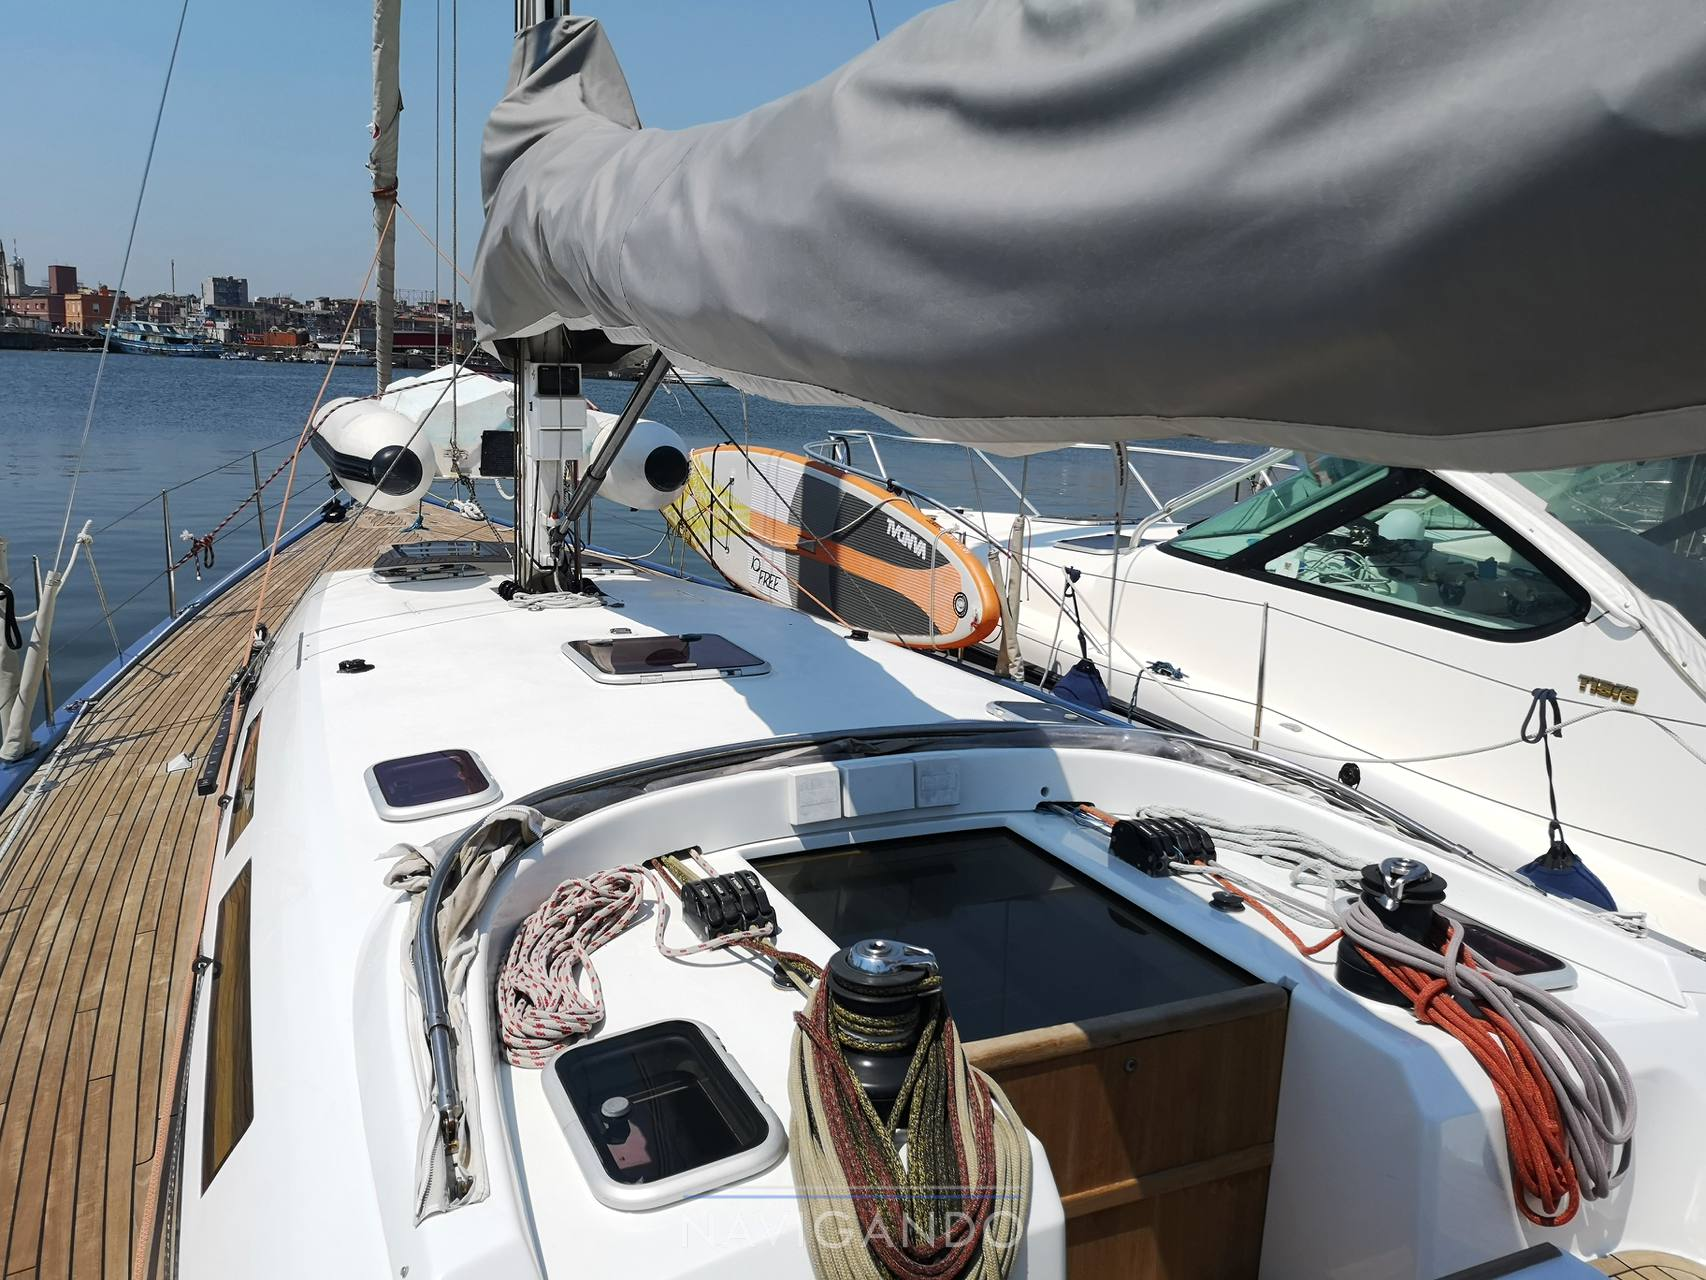 Felci YAcht  cost. Adria Adria Felci 49 Vela Crucero usado